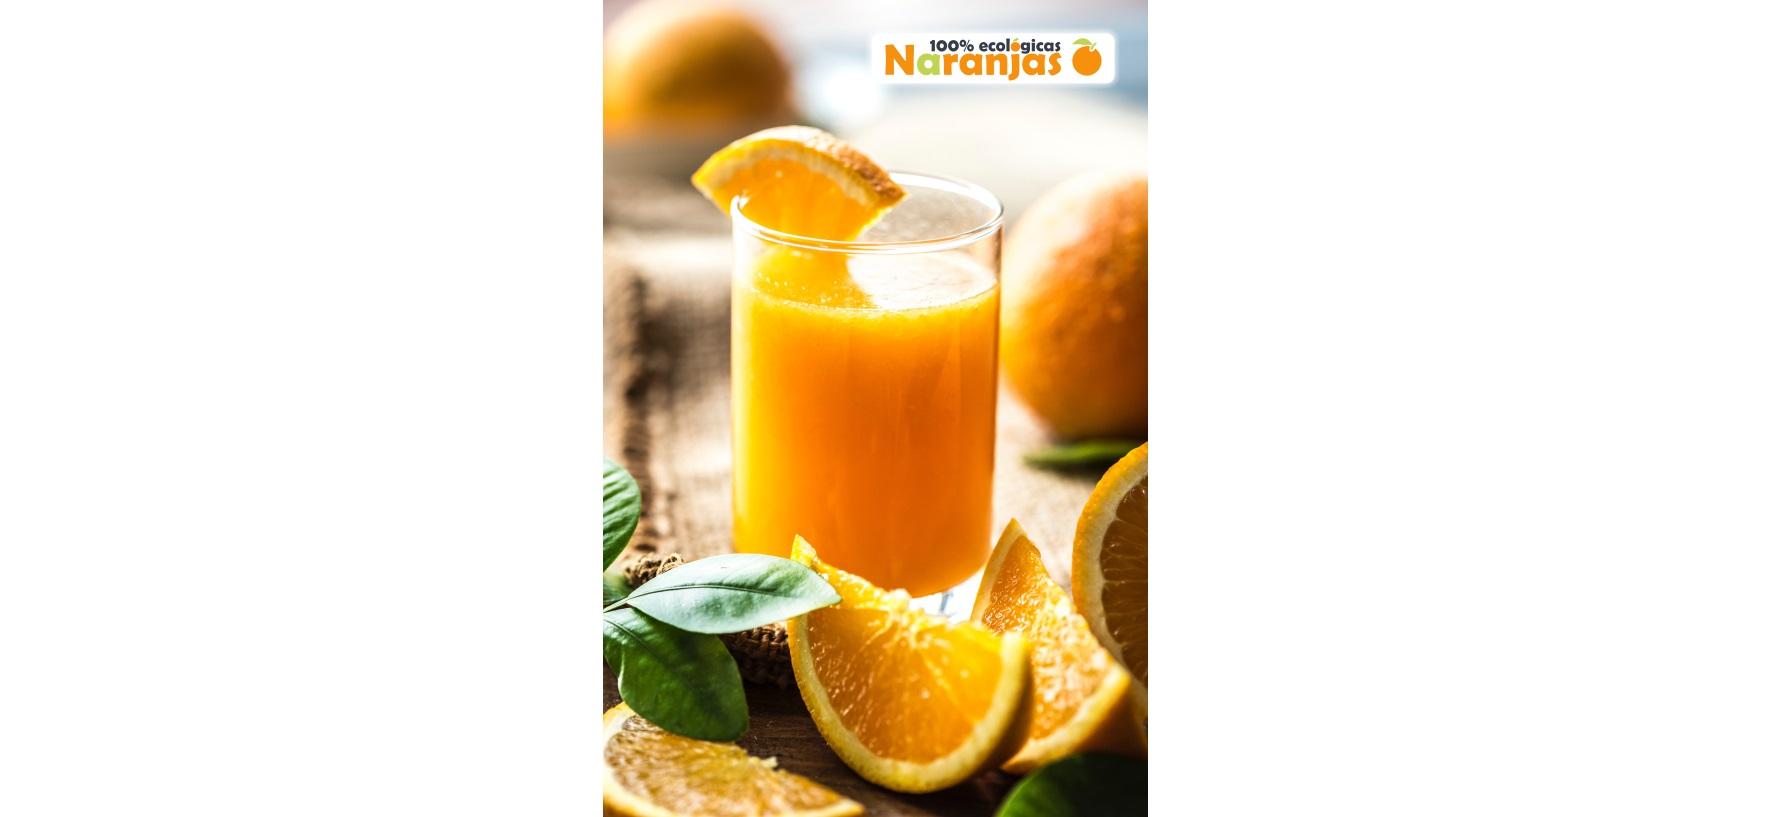 Desayuna un zumo de naranja ecológica